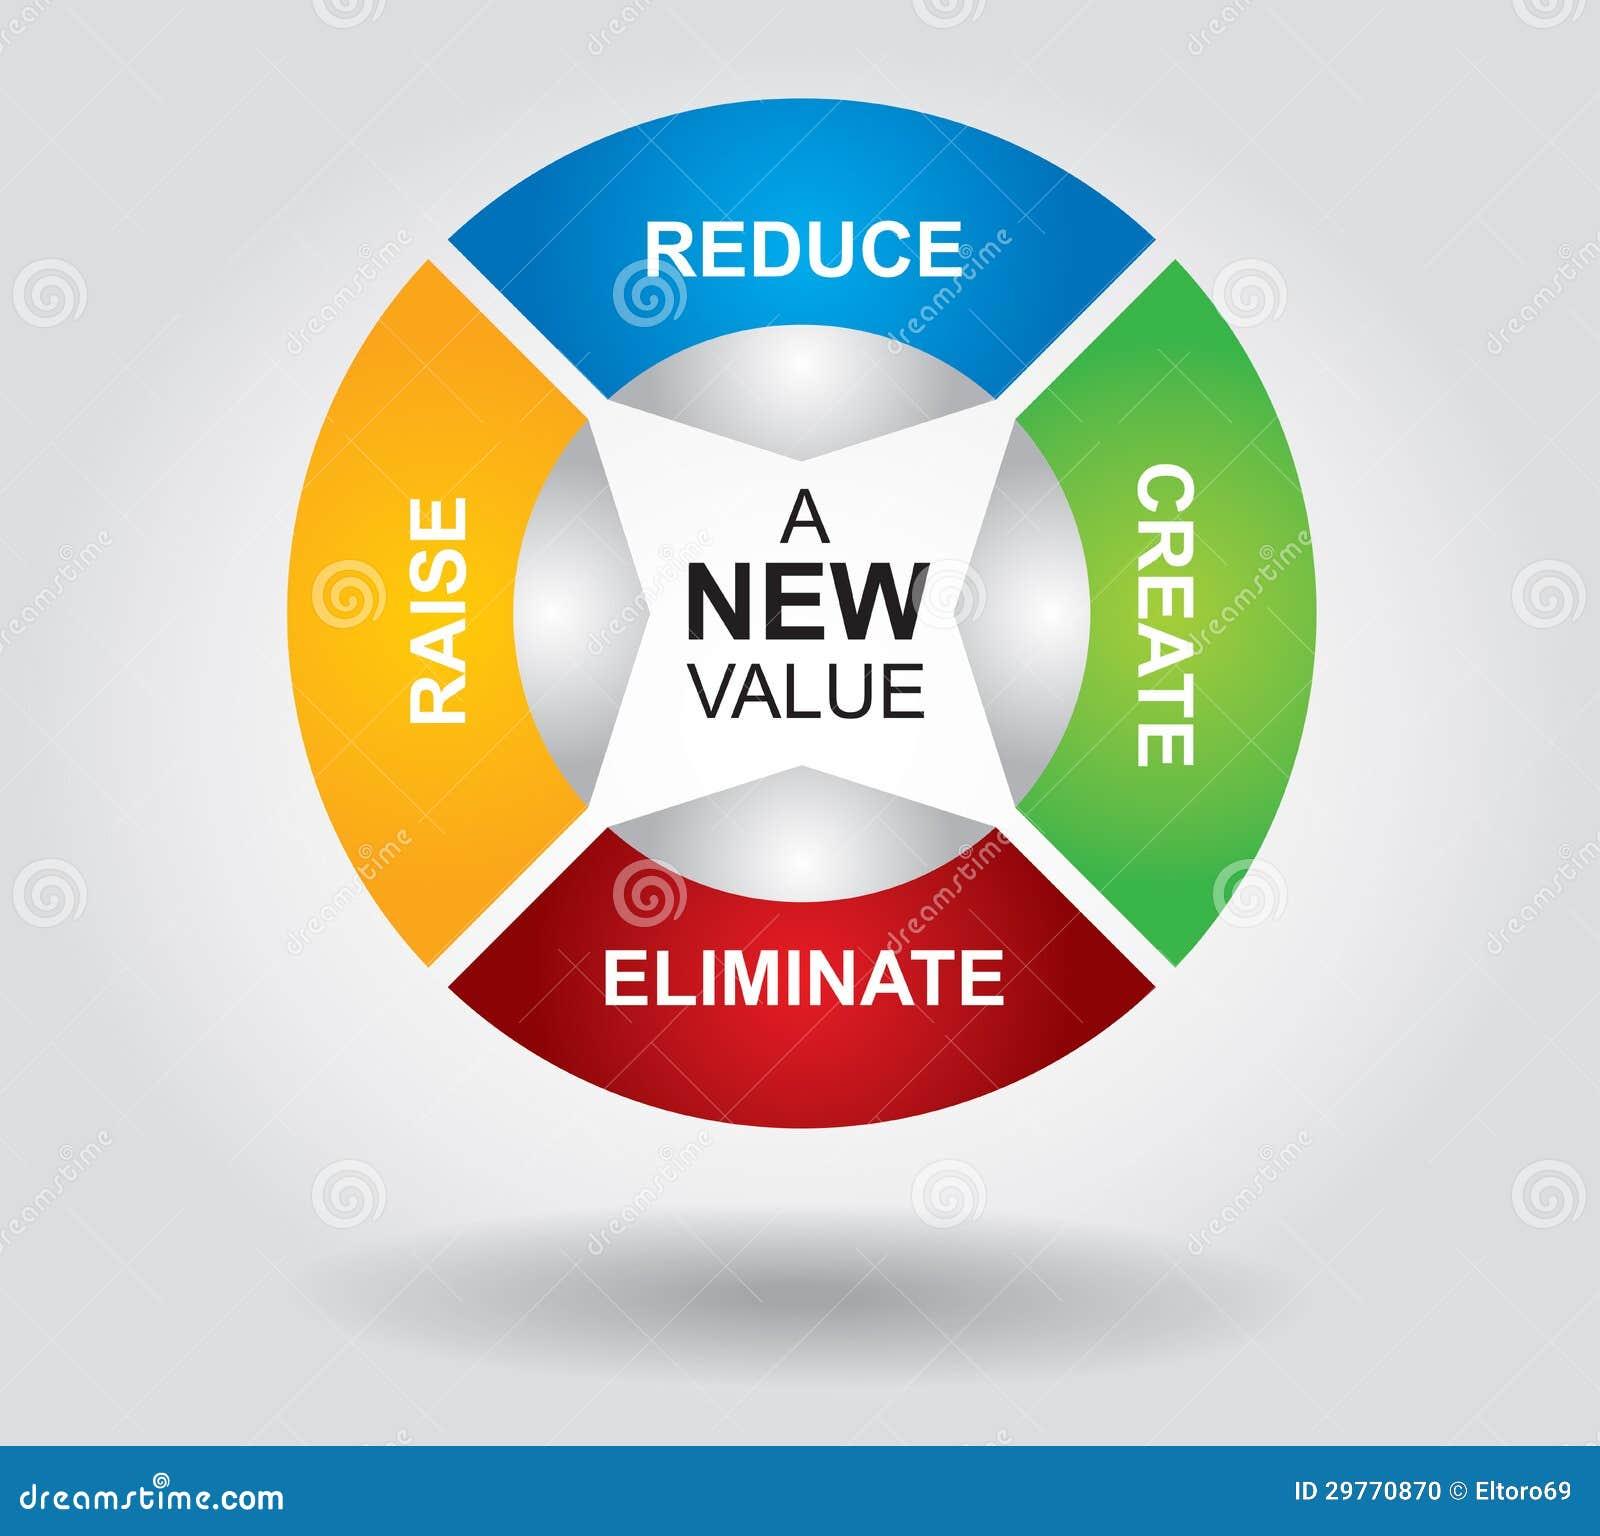 Create A New Value Stock Photo - Image: 29770870